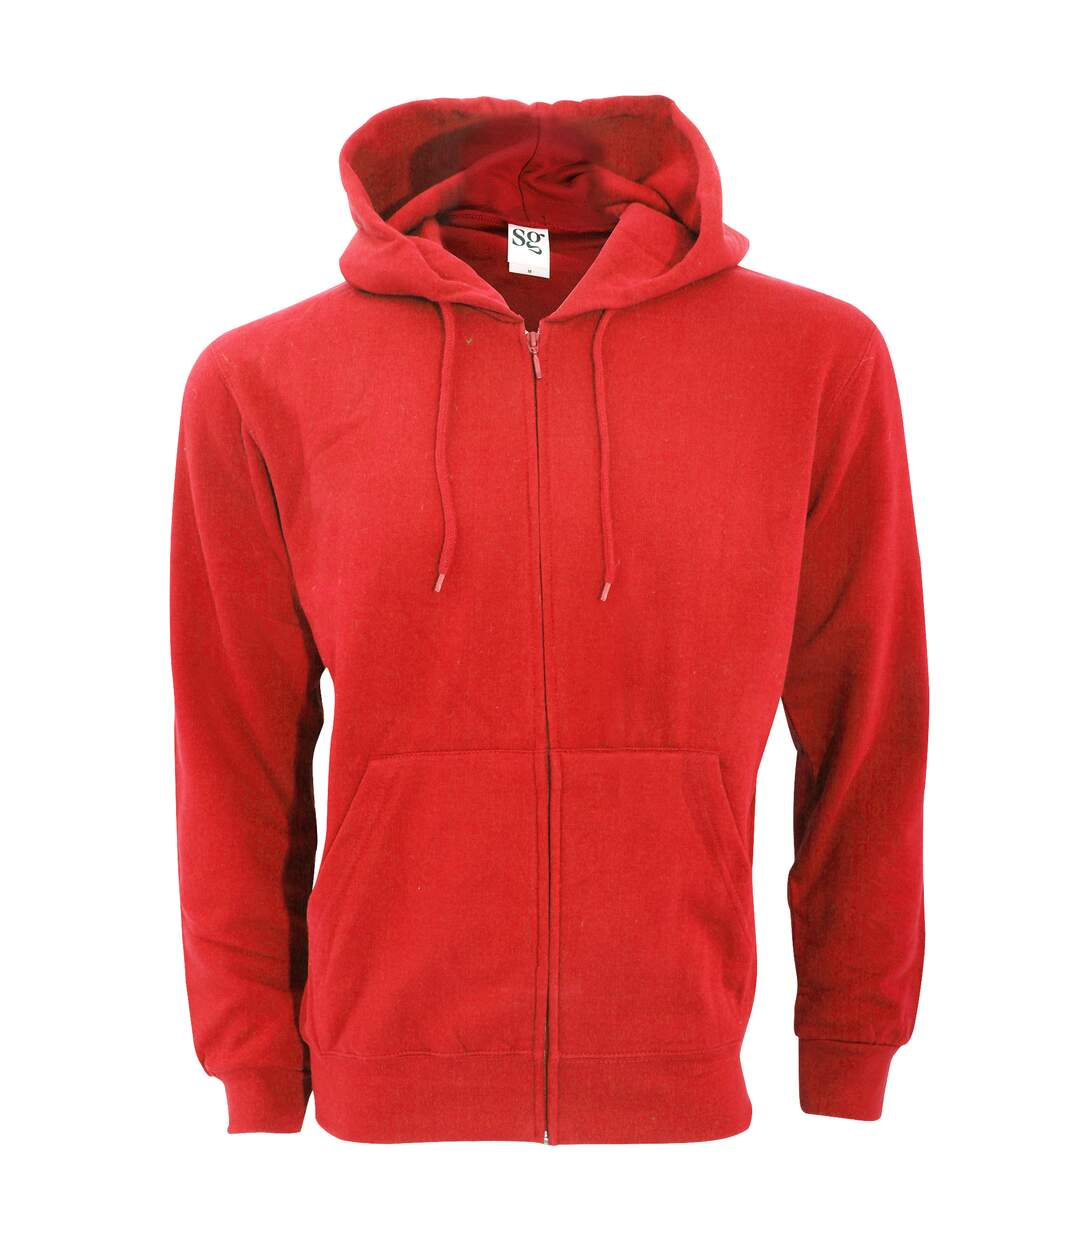 SG Mens Plain Full Zip Hooded Sweatshirt (Red) - UTBC1075